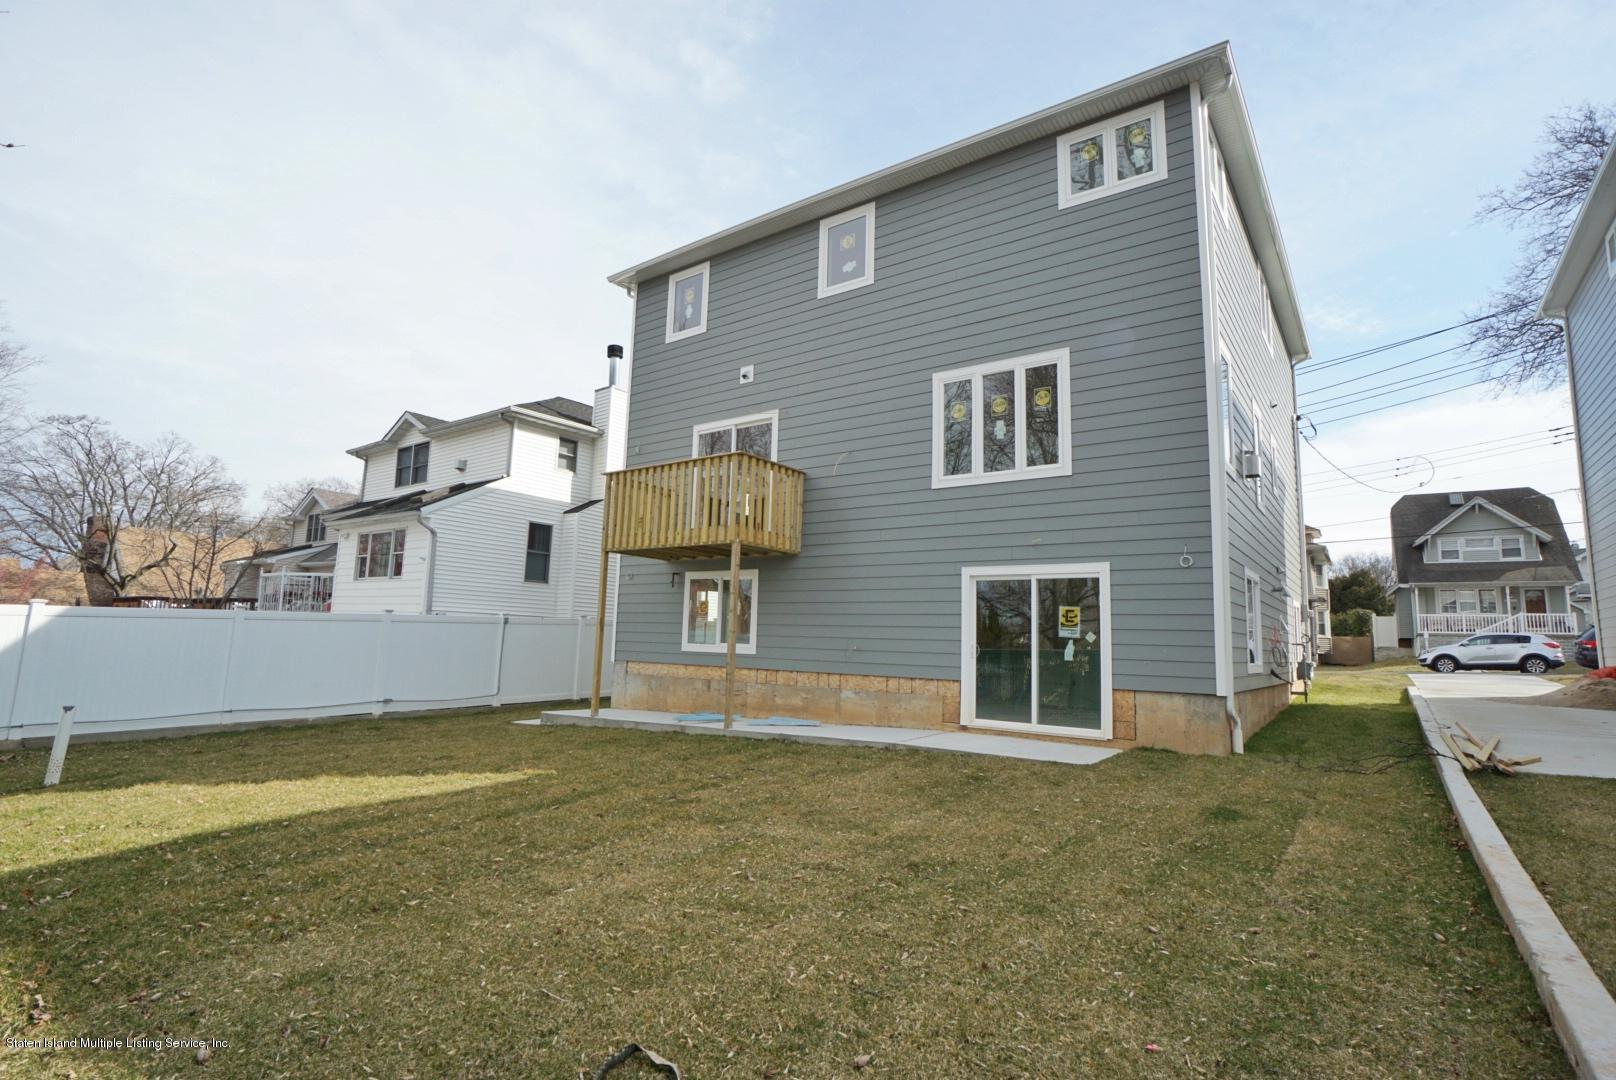 Single Family - Detached 170 Fairview Avenue  Staten Island, NY 10314, MLS-1126684-13